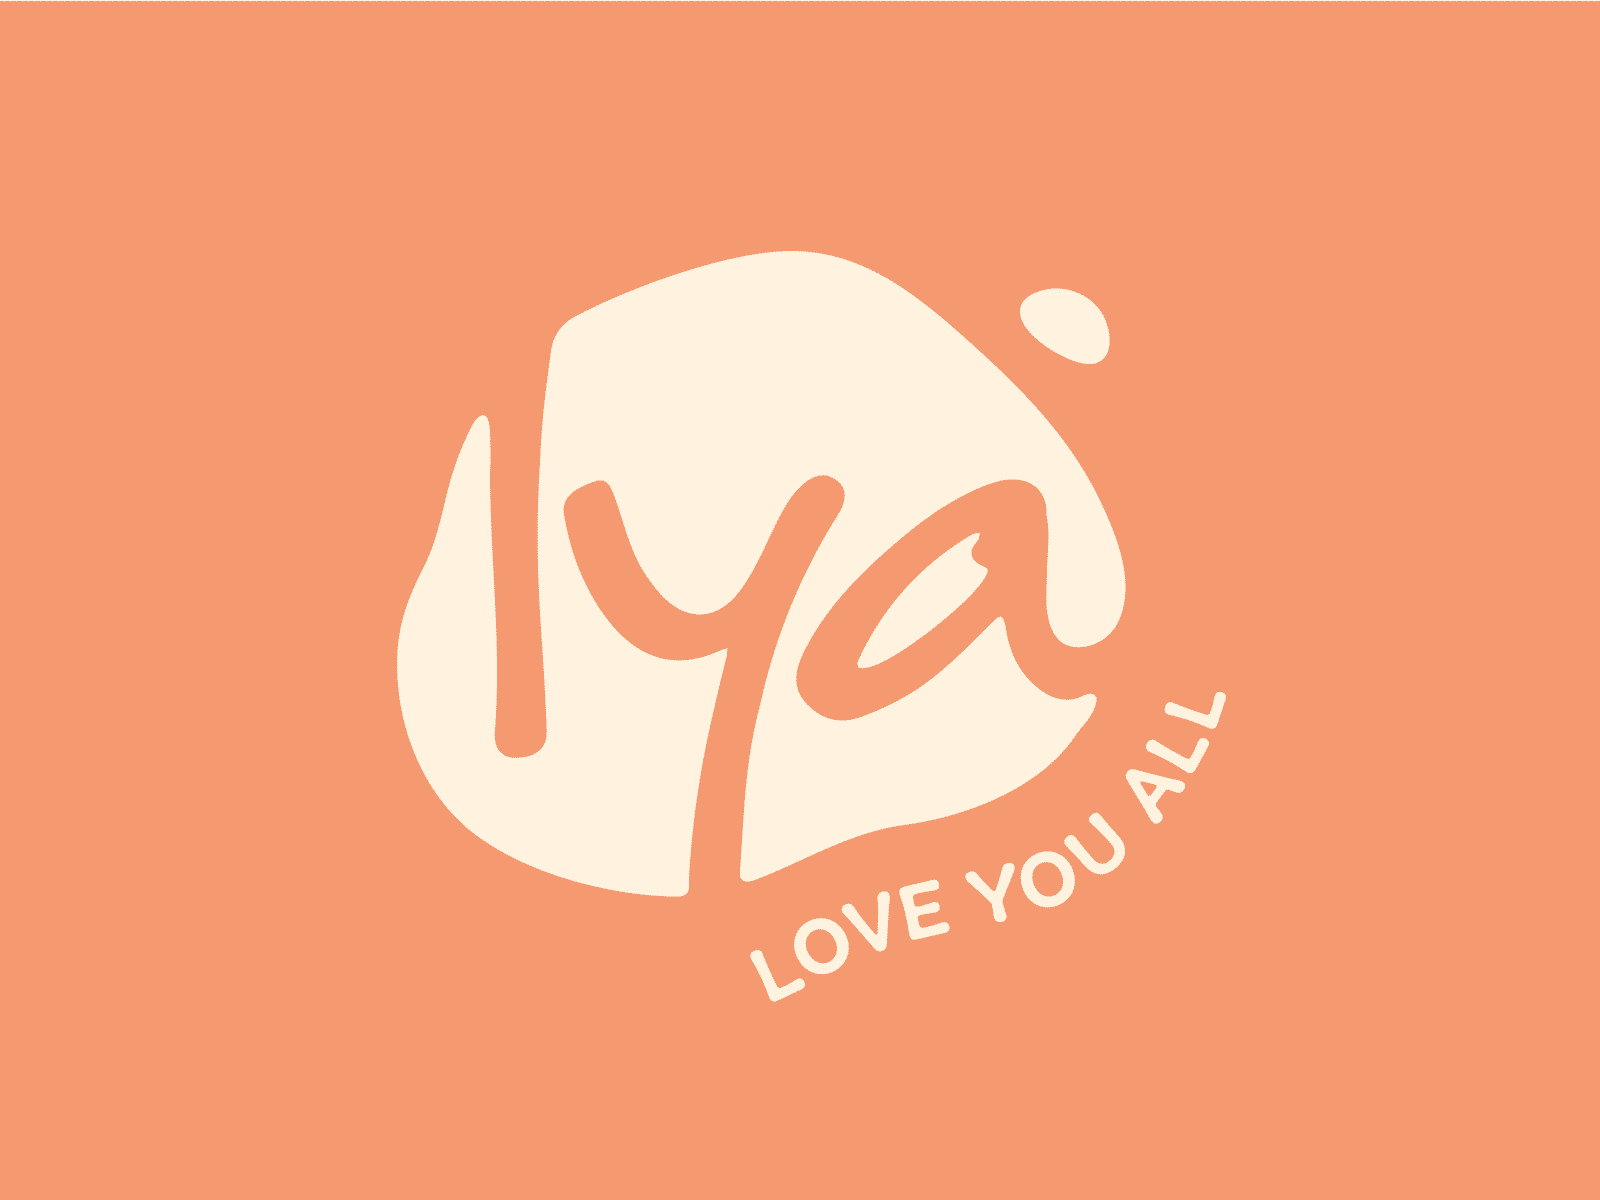 Love you all Logo Design